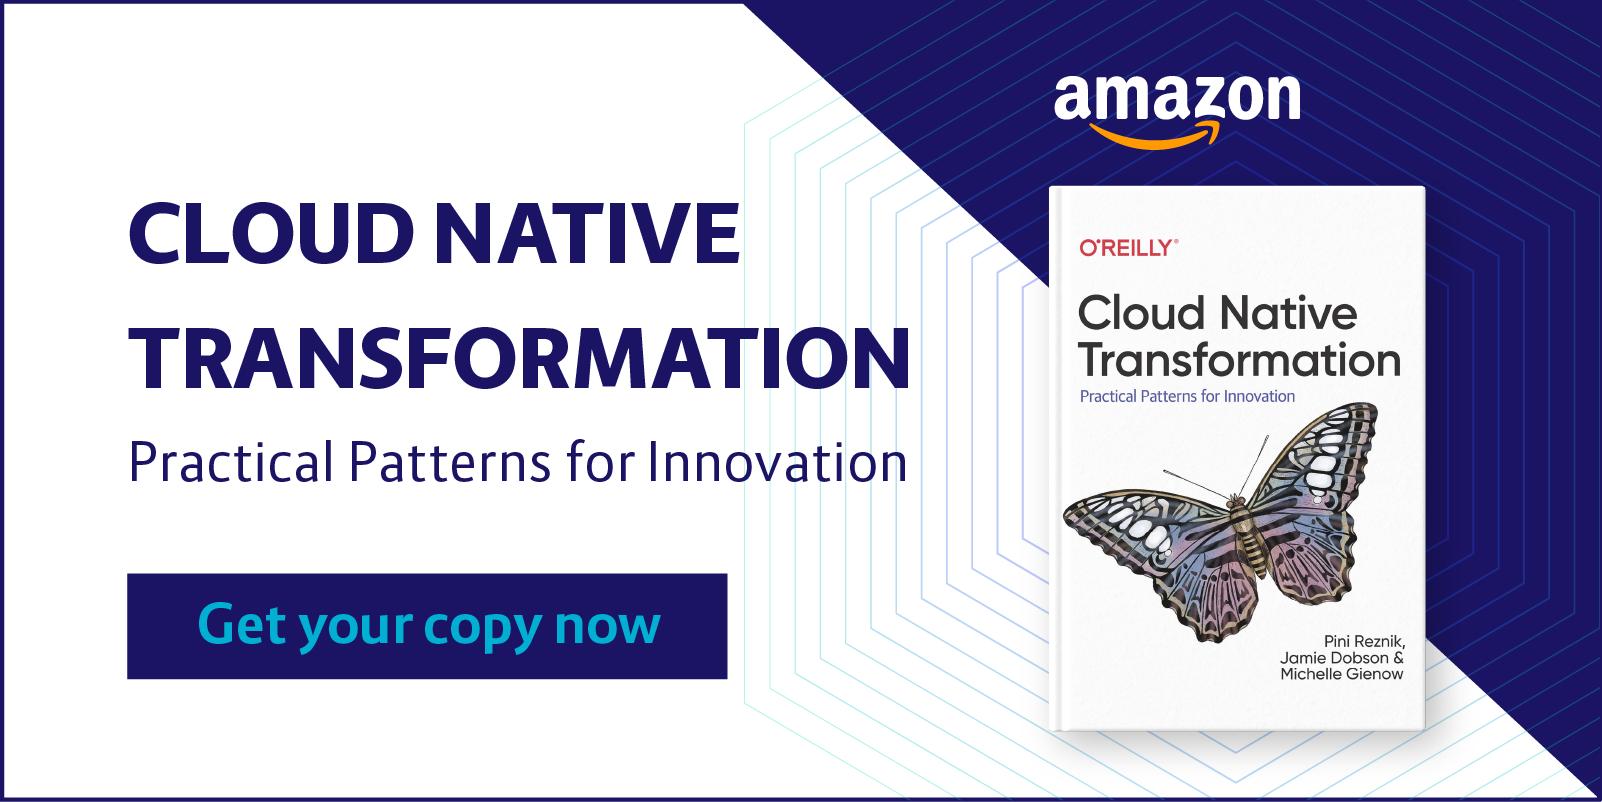 cloud_native_transformation_oreilly_book